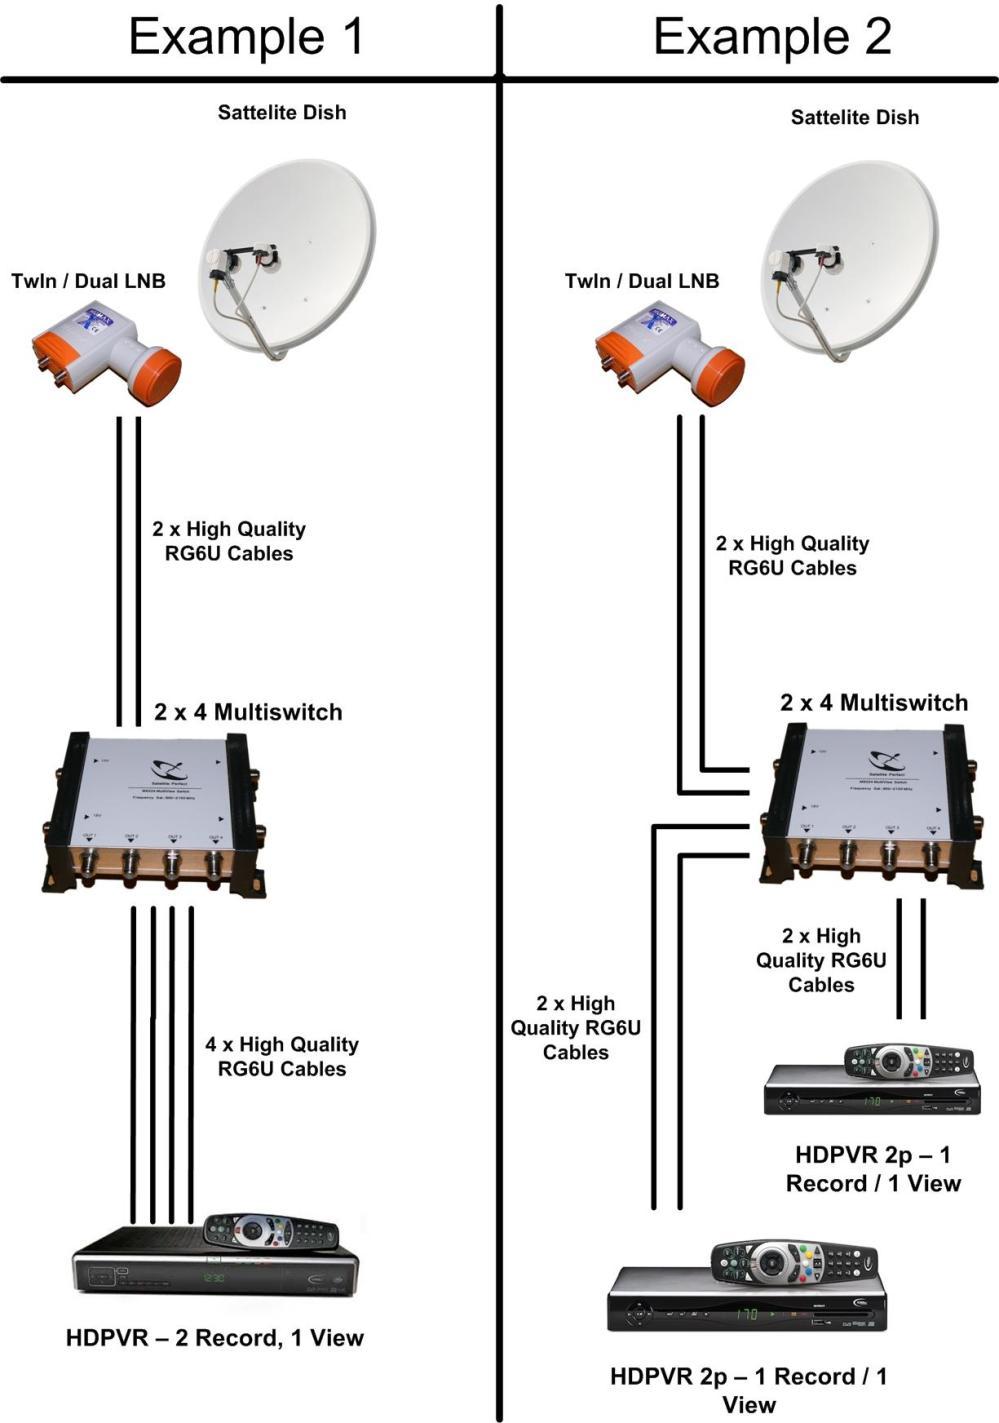 medium resolution of dstv installations 0833726342 signal correction upgrades on at t u verse box